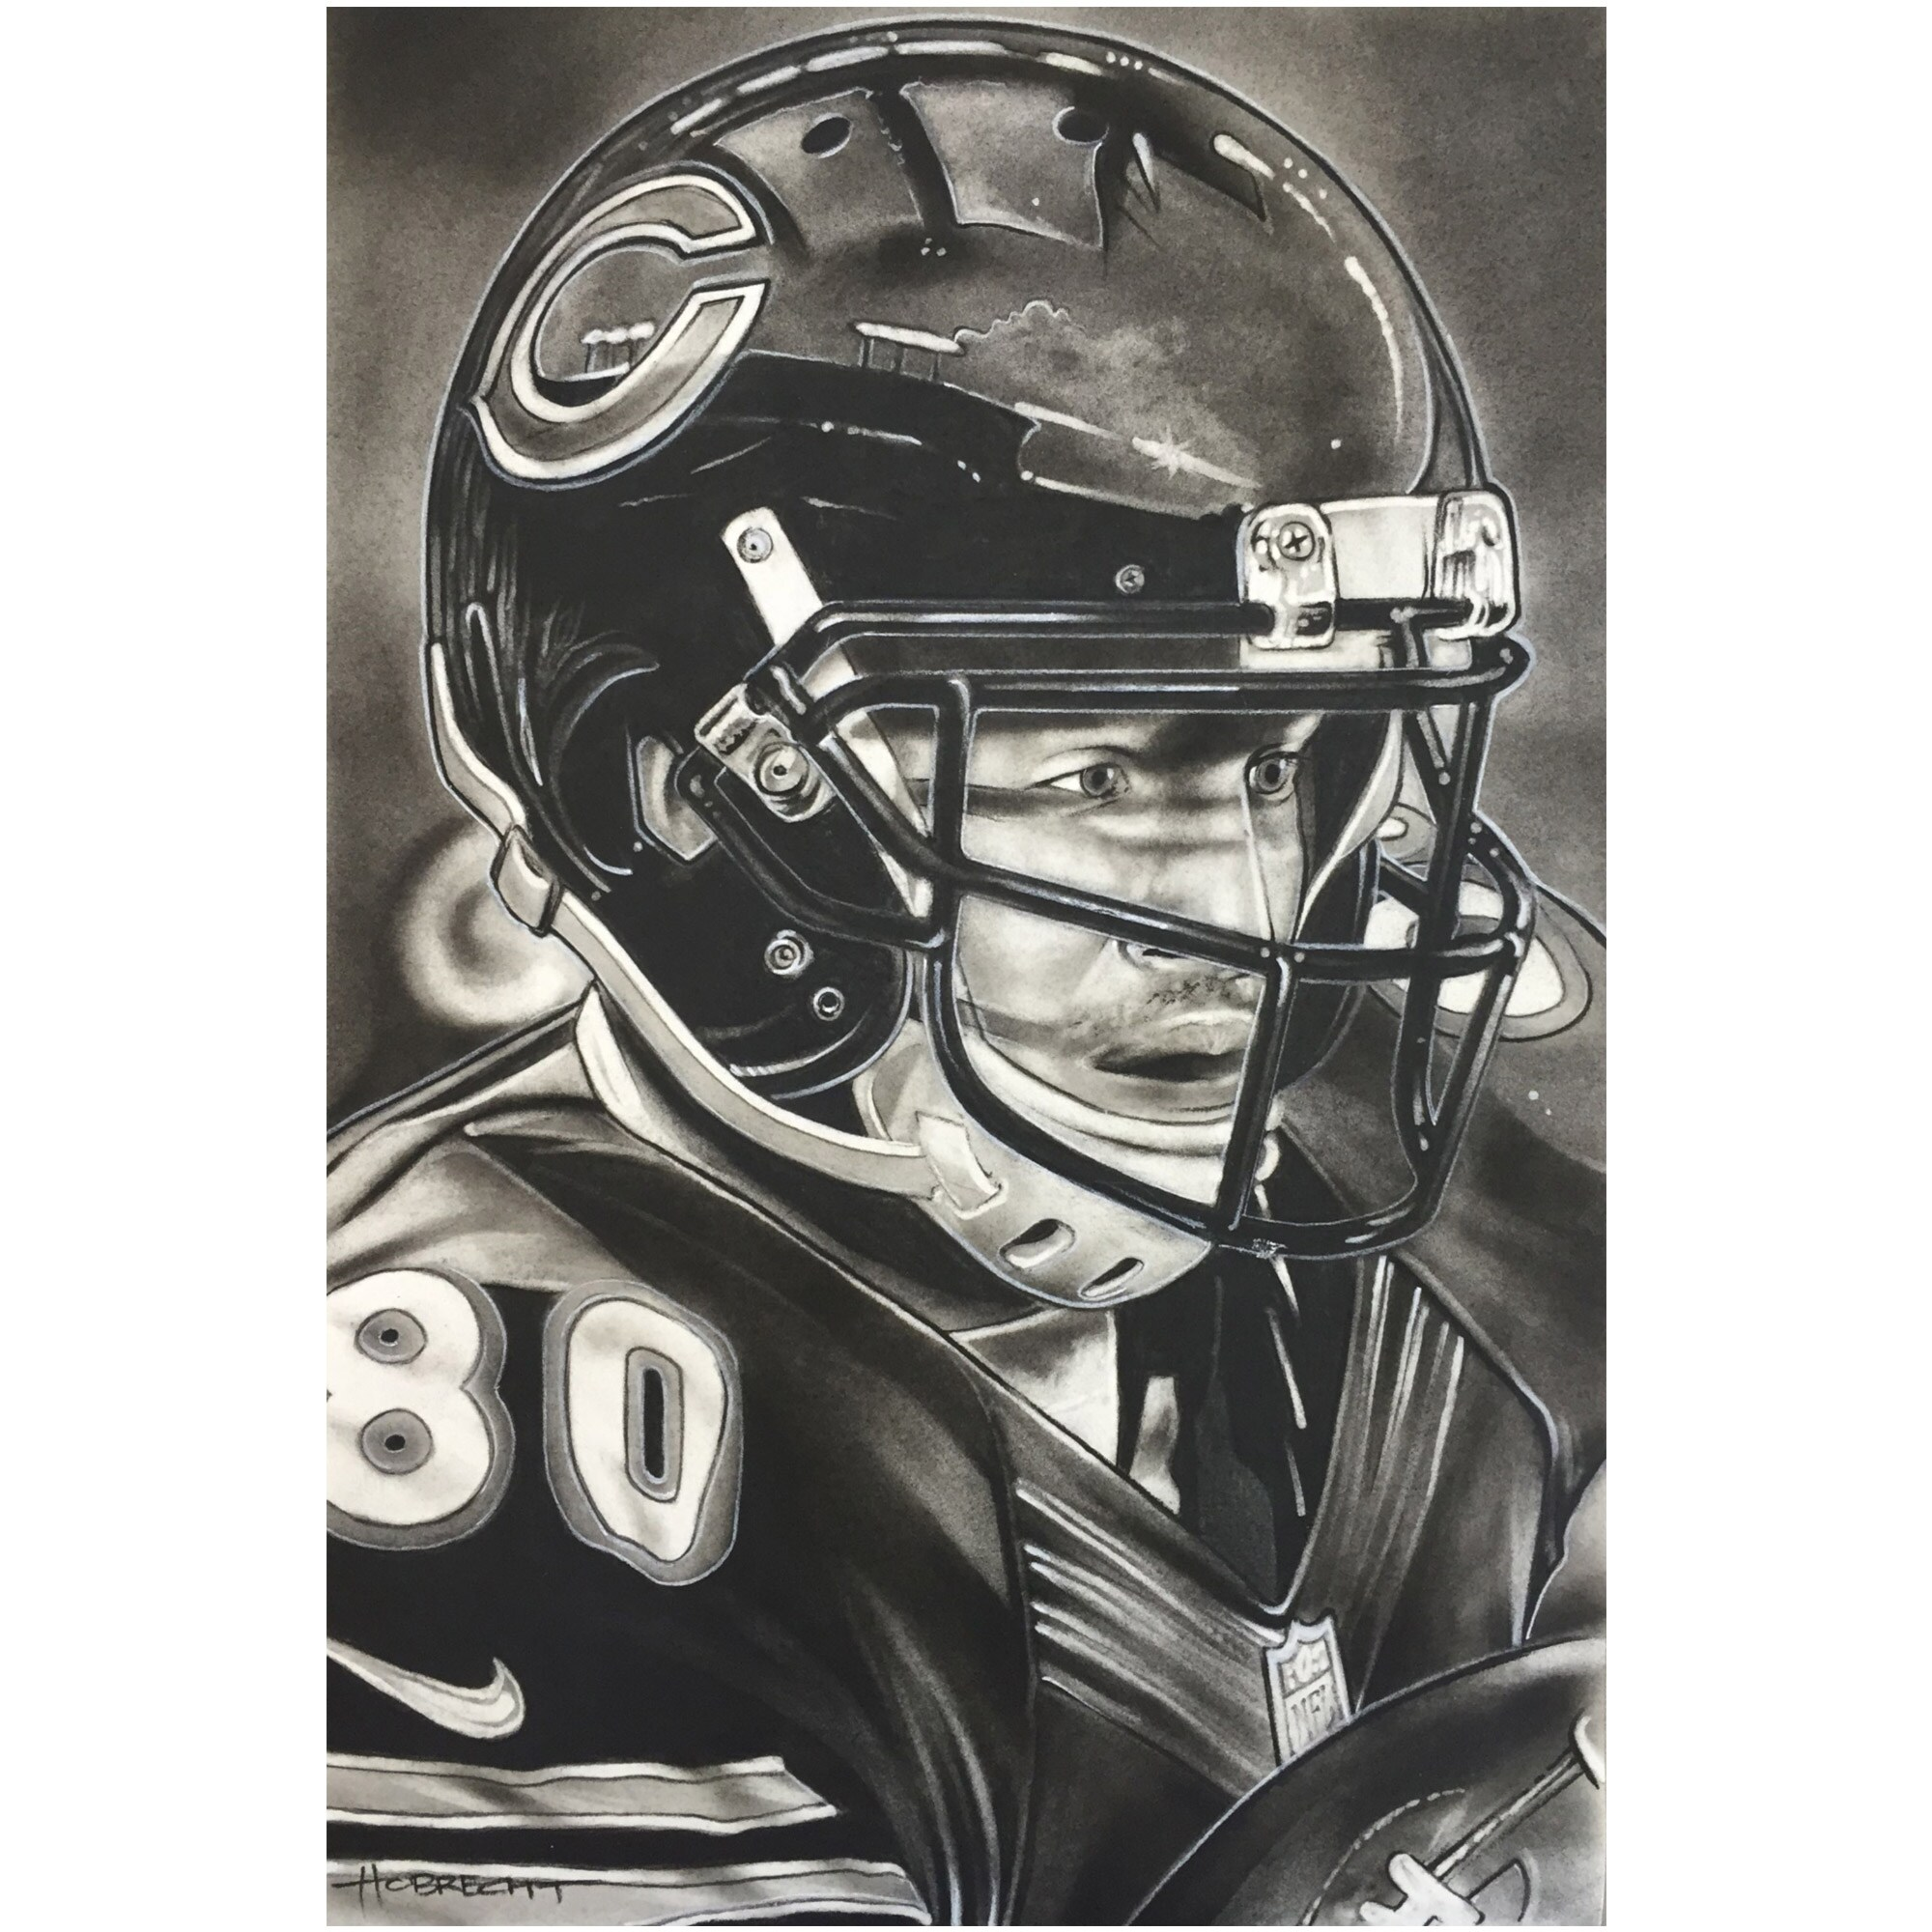 "Chicago Bears Deacon Jones Foundation 14"" x 9"" Helmet Series Fine Art Giclée Canvas"